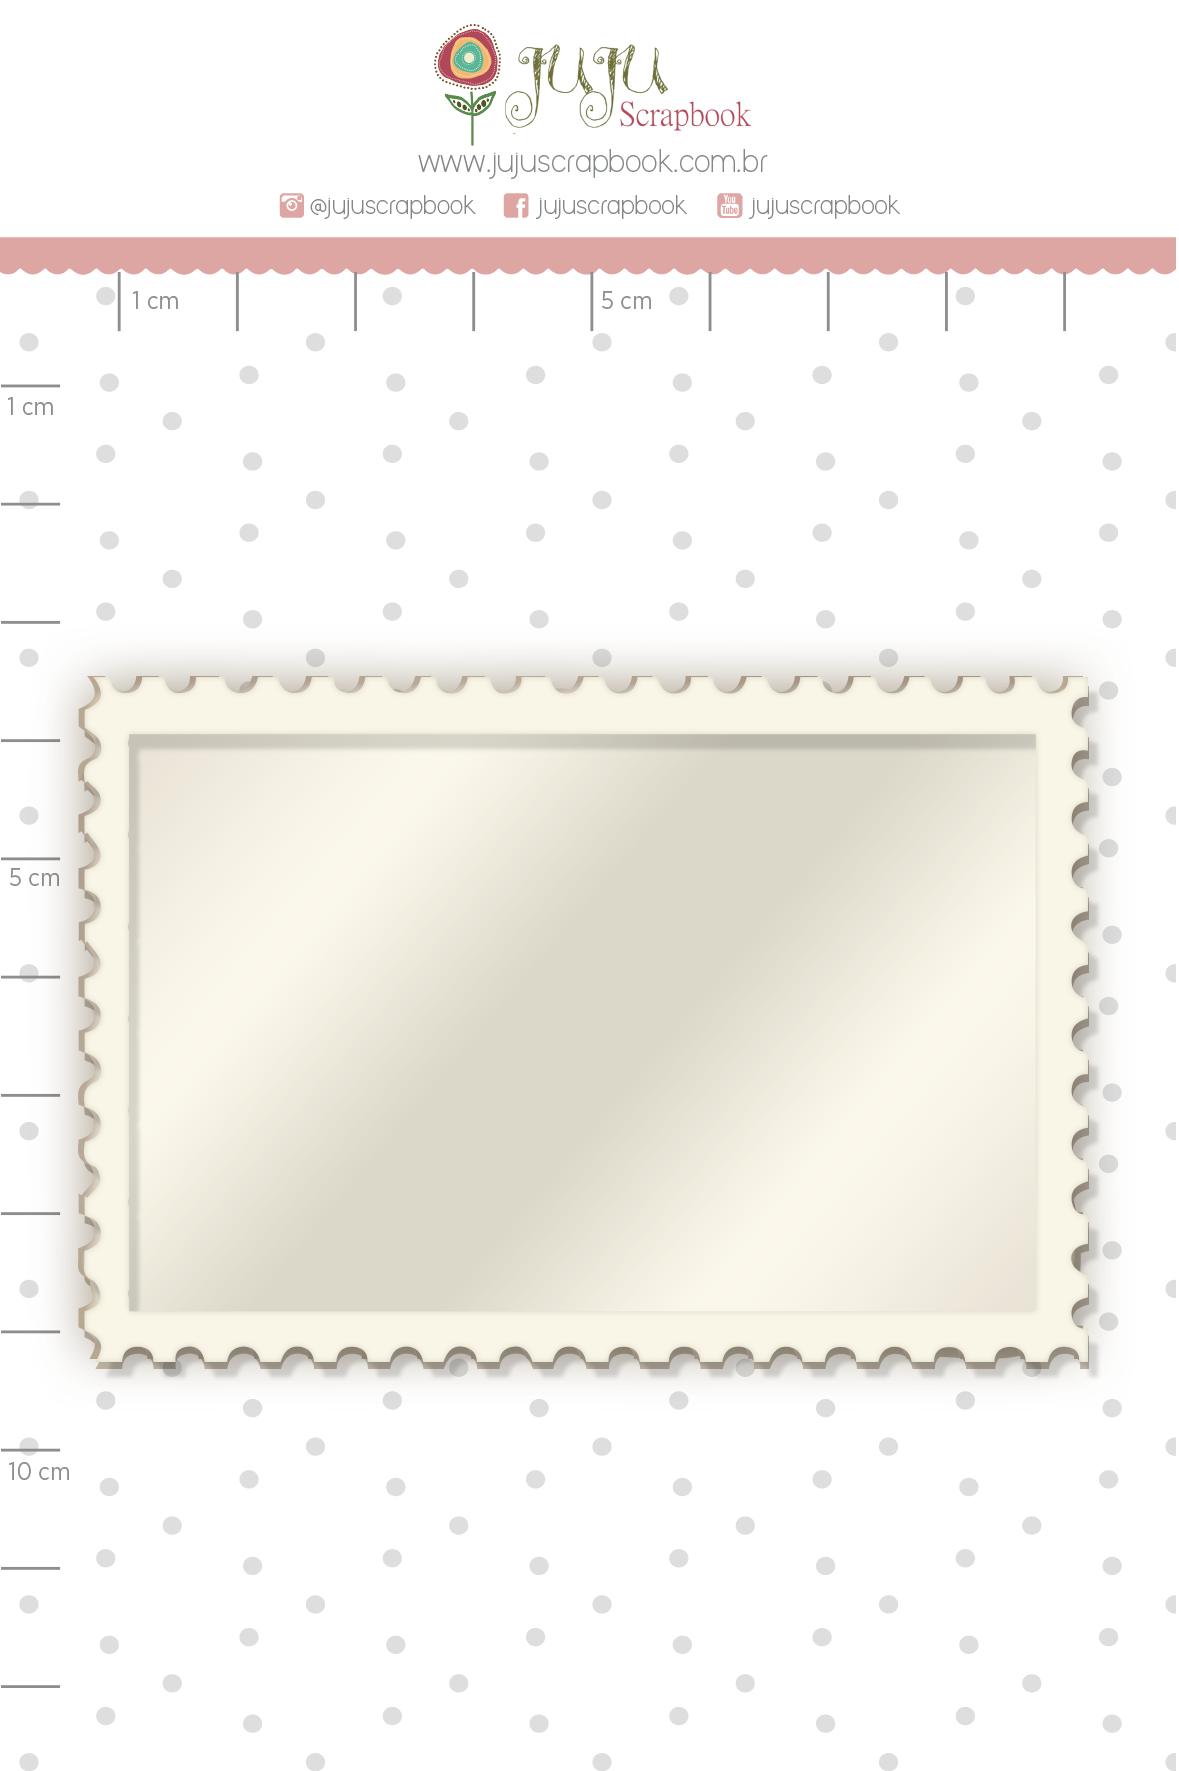 Shaker Chipboard Branco Moldura - Coleção Família para Sempre - JuJu Scrapbook  - JuJu Scrapbook